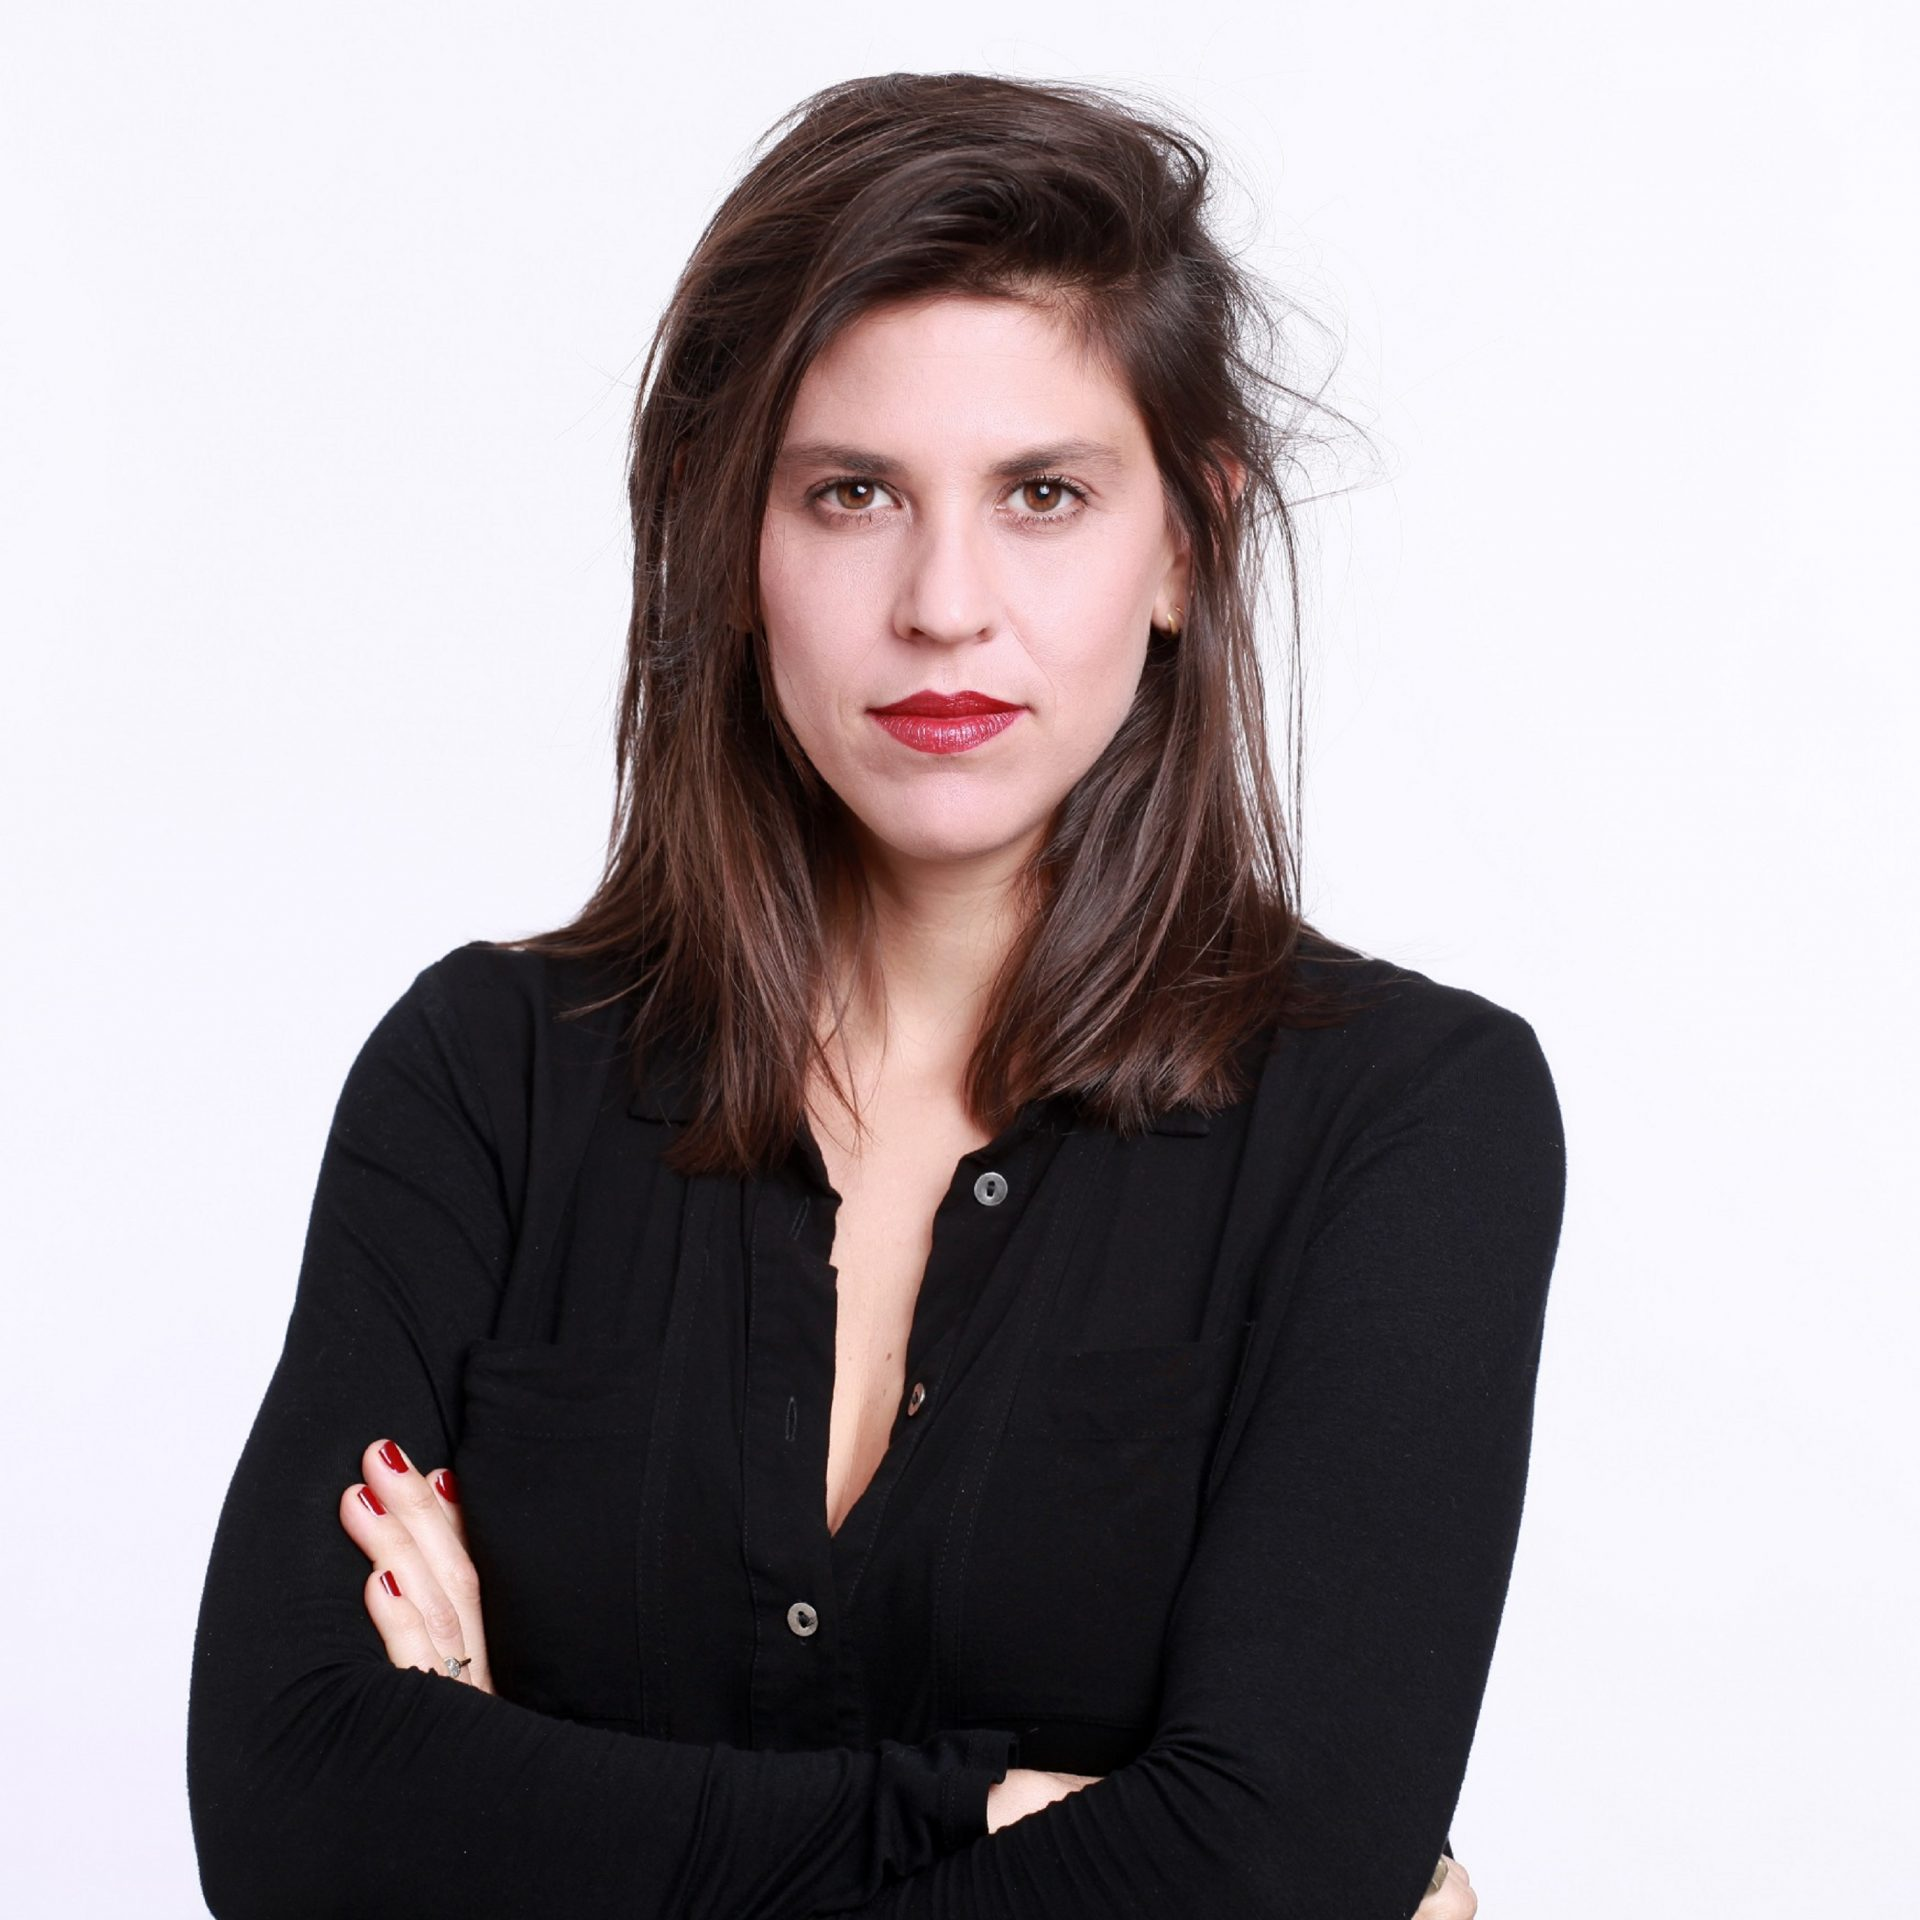 דנה בלנקשטיין כהן (צילום: אילן בשור)